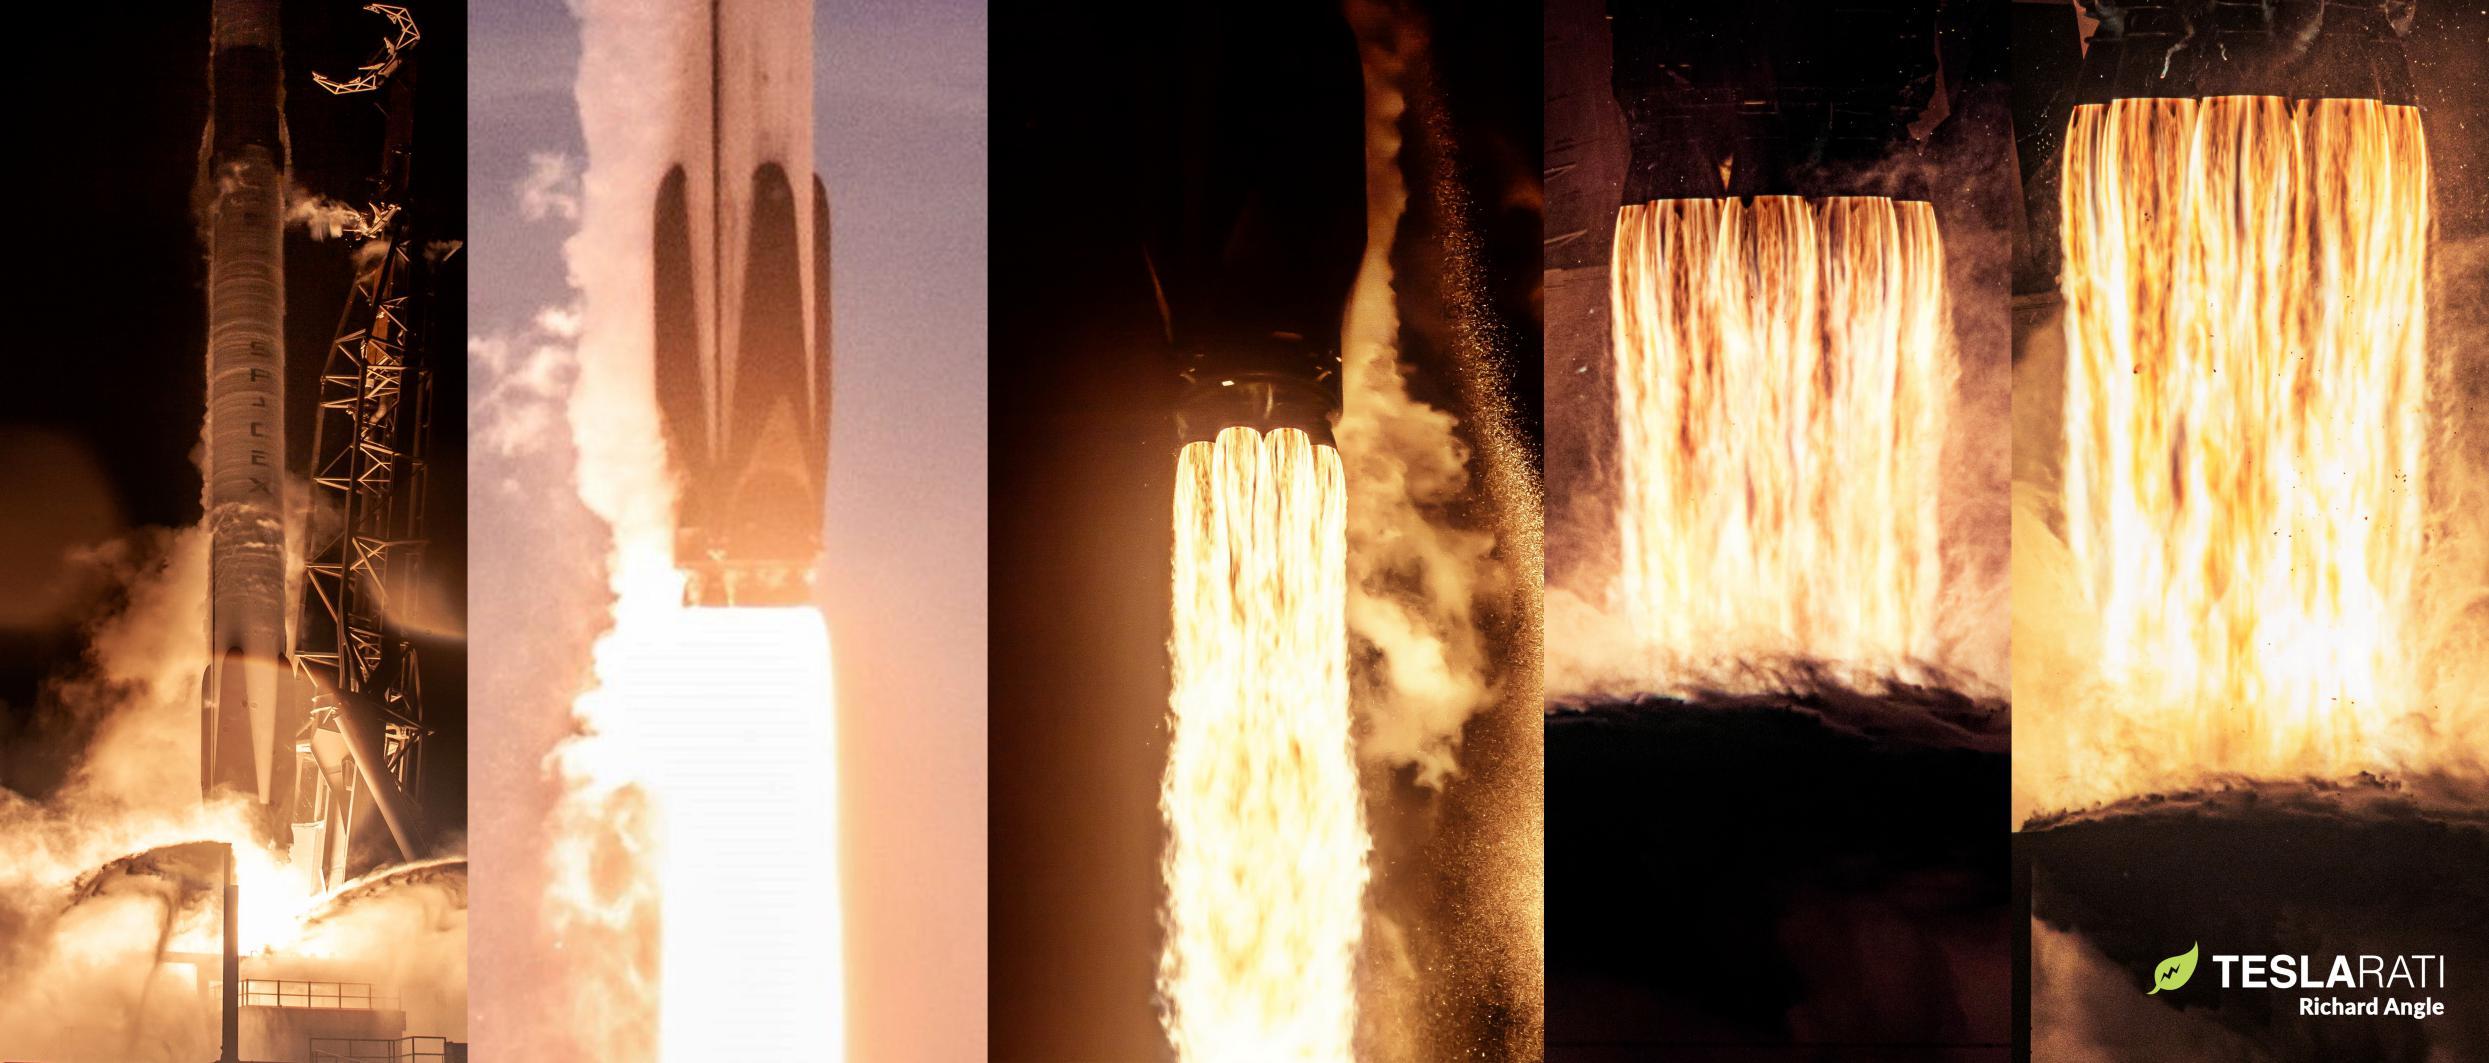 B1049 Telstar 18V Iridium-8 Starlink v0.9 -3 -8 (SpaceX – Richard Angle) 1 (c)